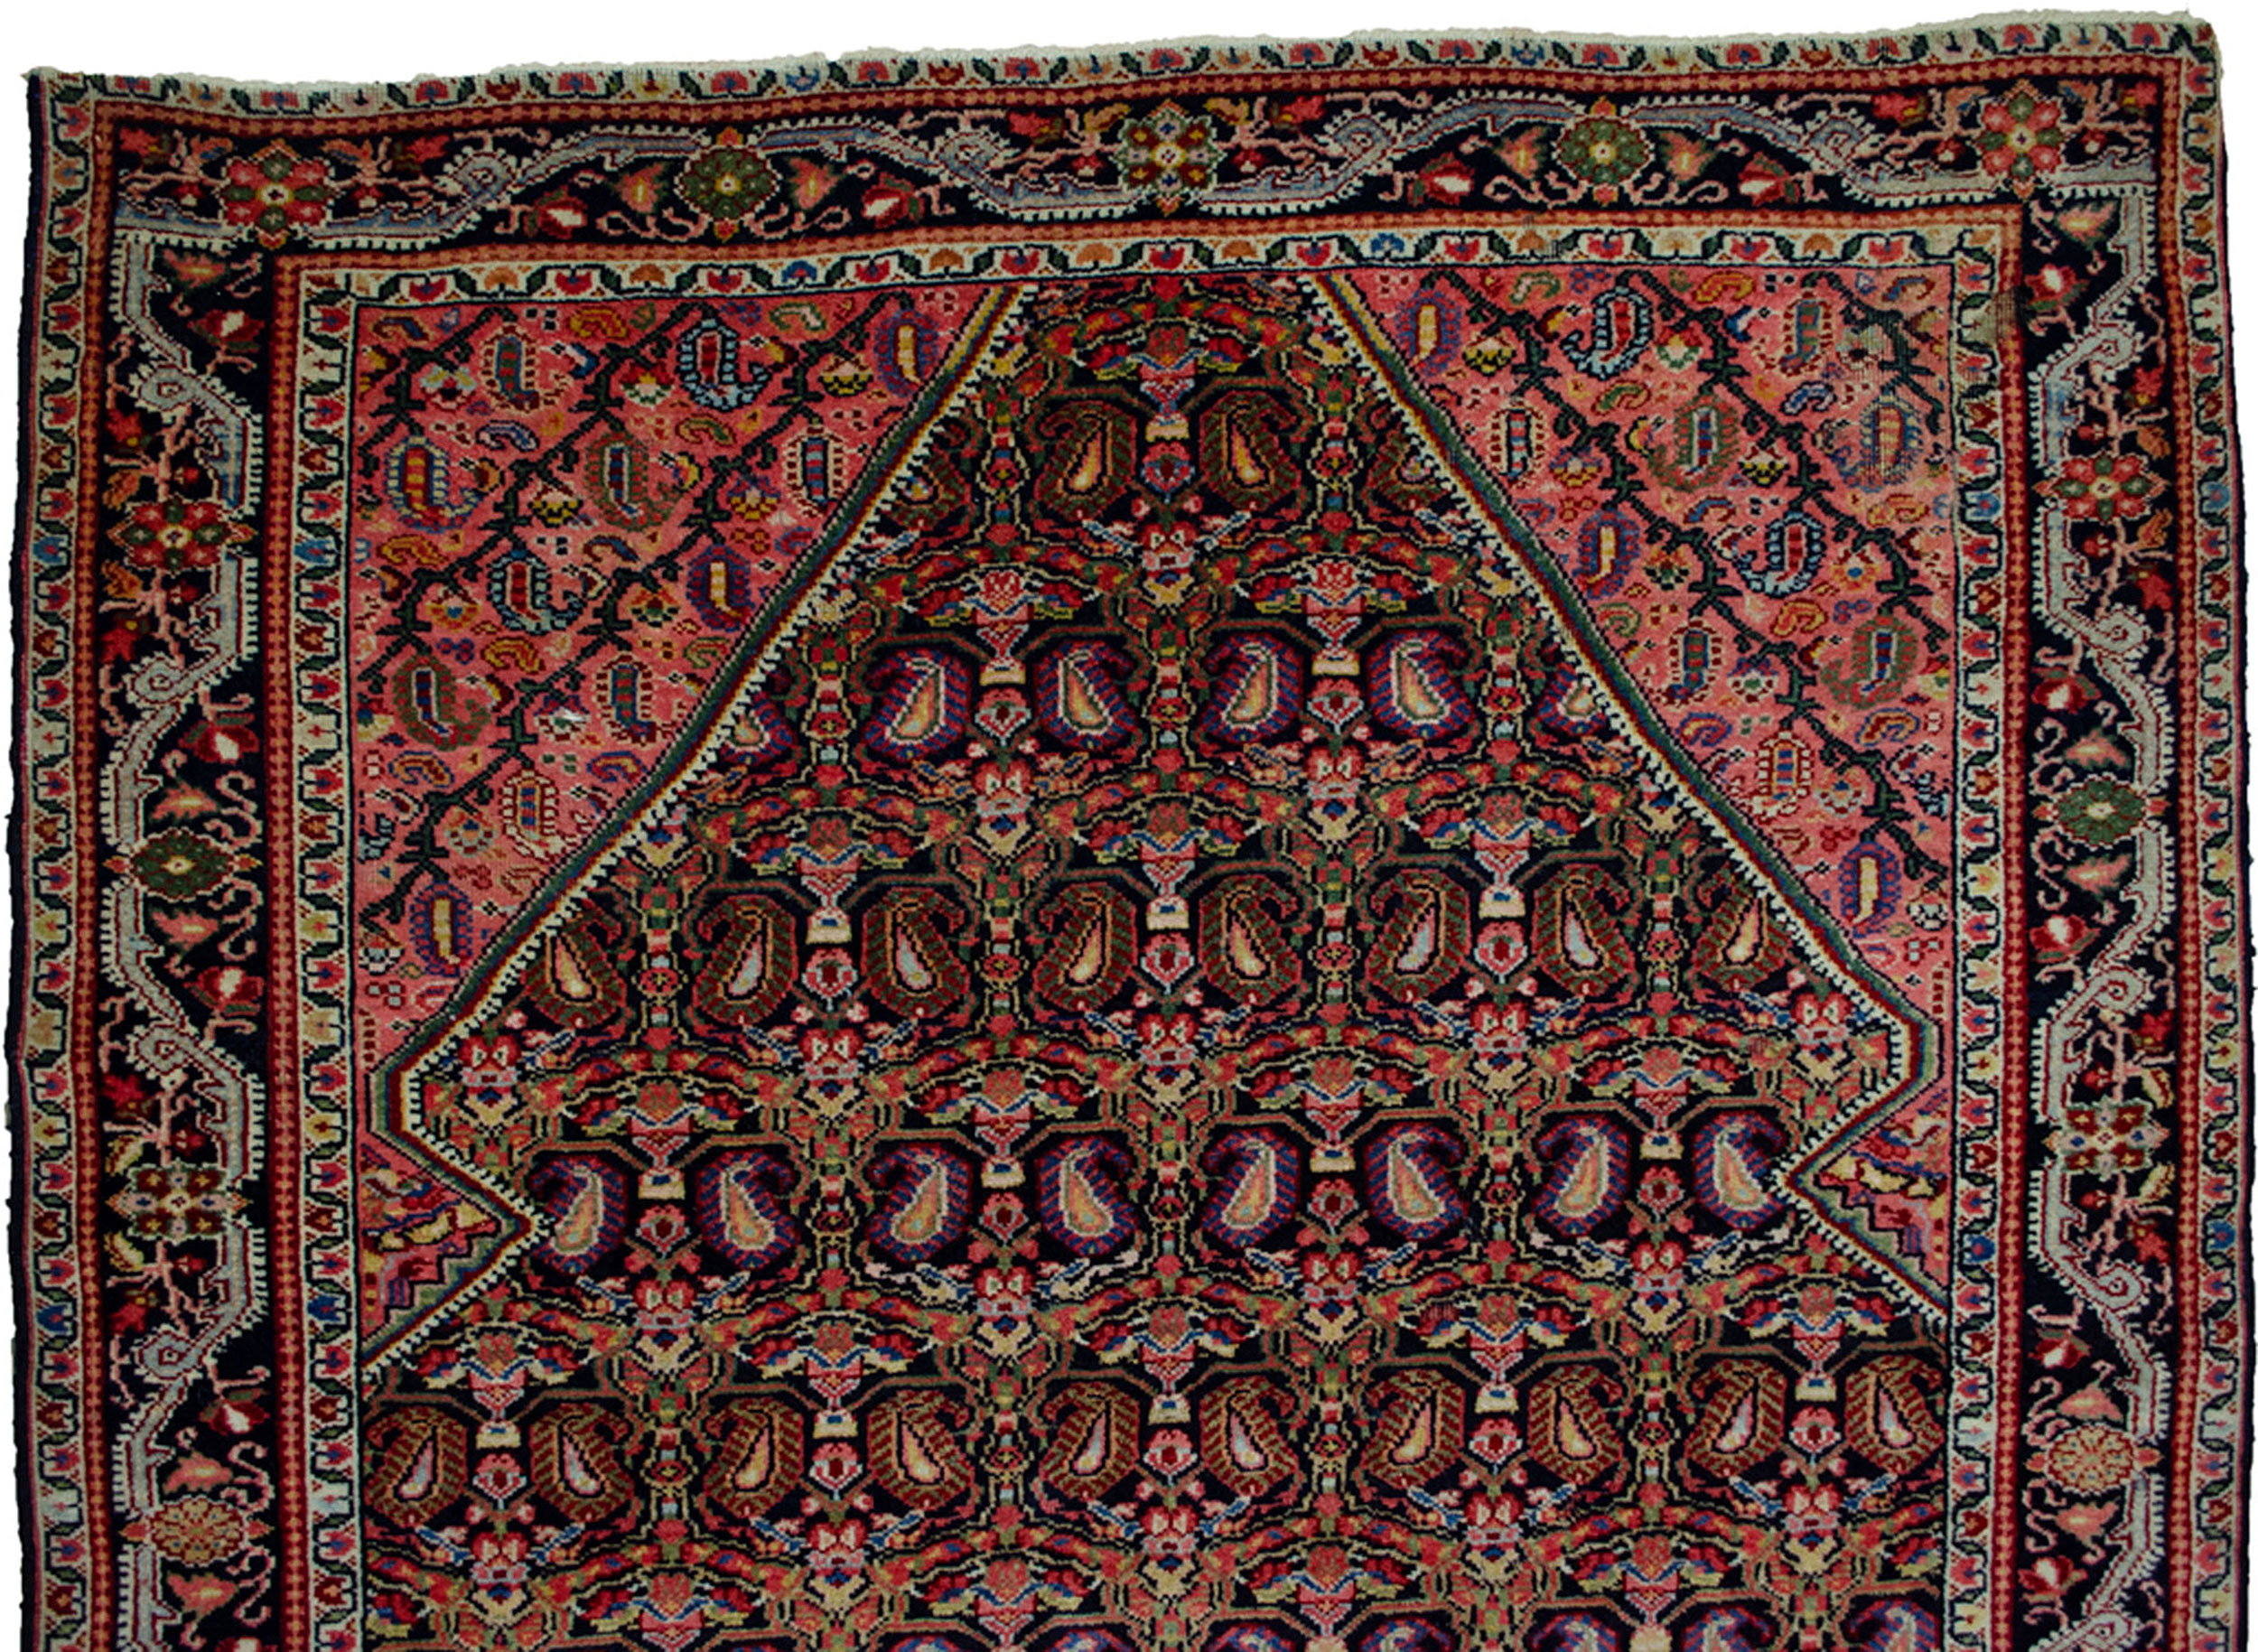 Antique Jozan Rug 145x105cm